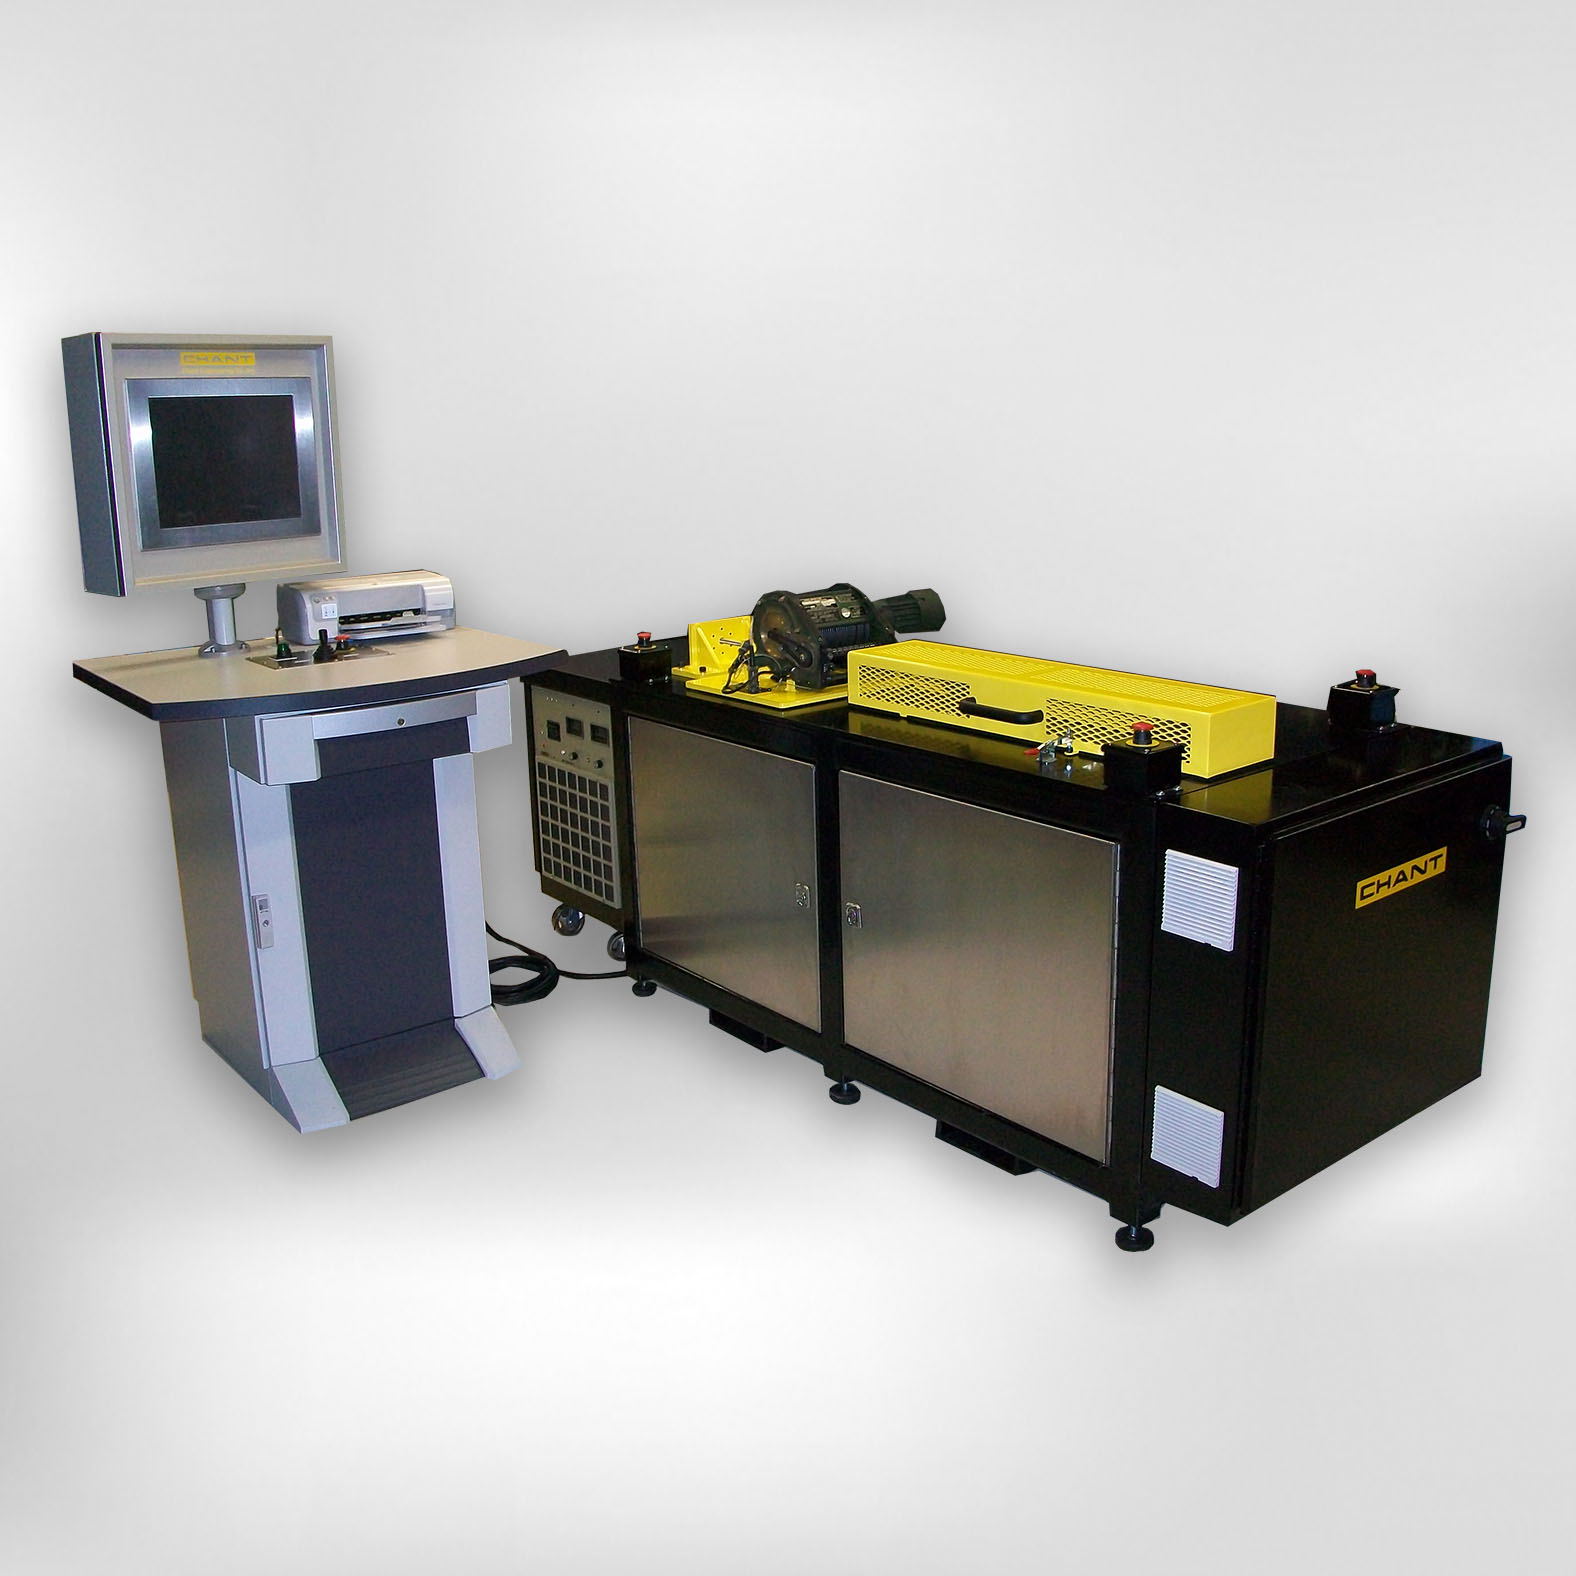 9857-01 Hoist Test Stand